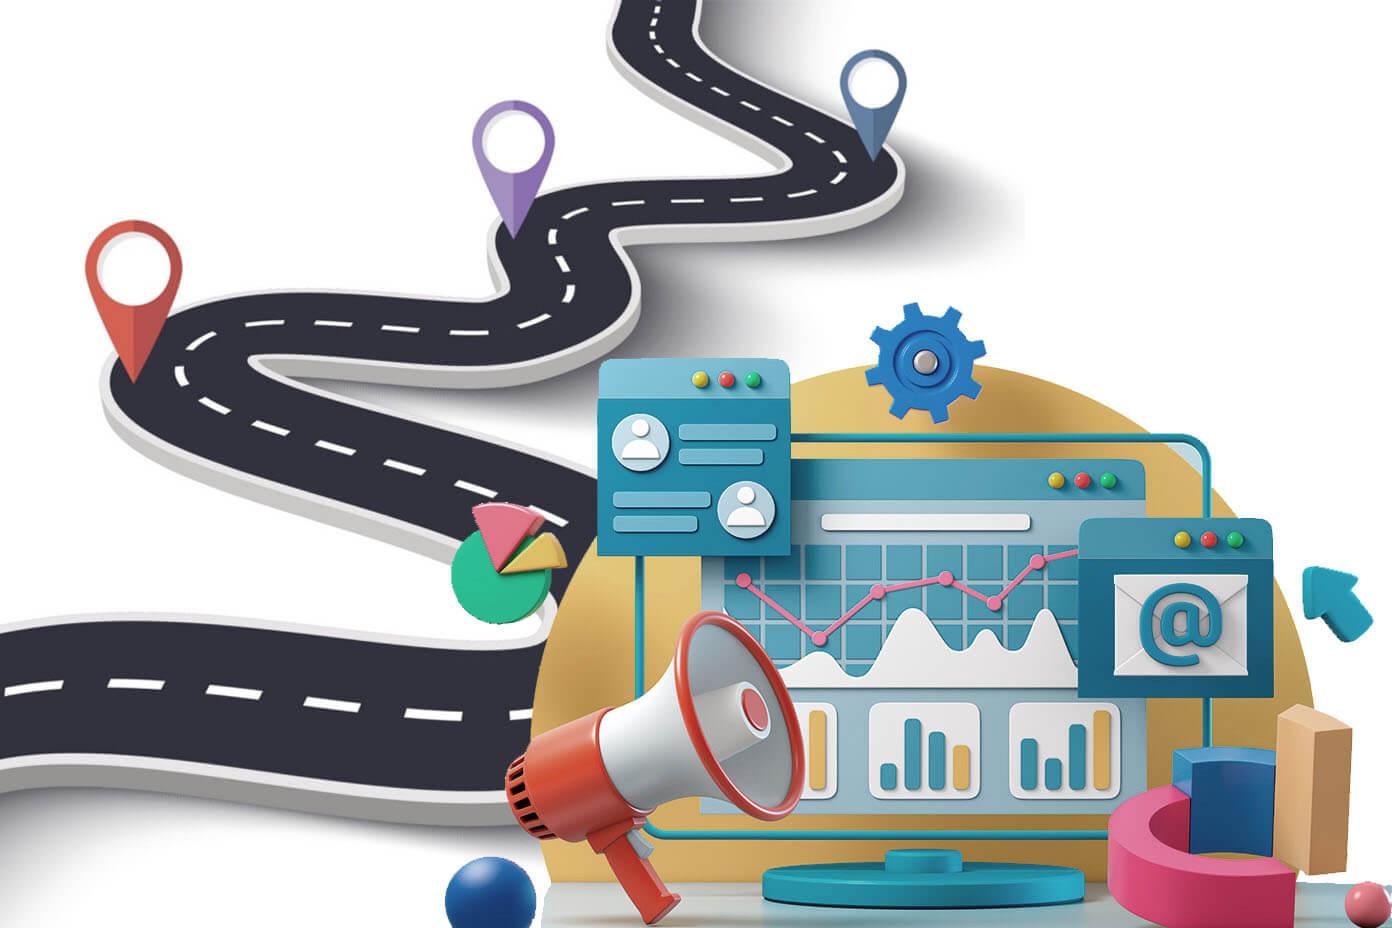 How to Chalk Out an Effective Mar-tech Roadmap?